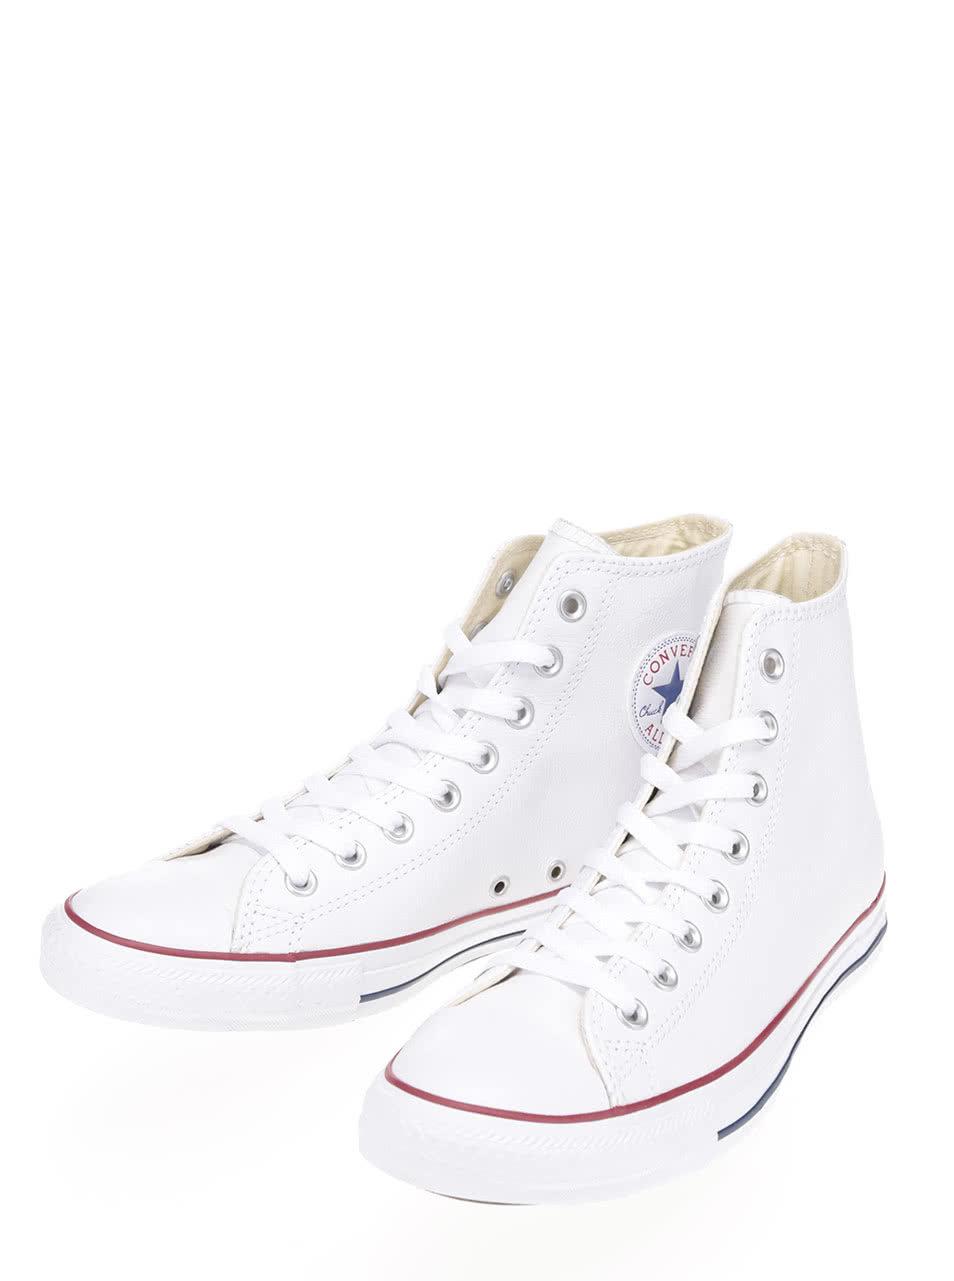 Bílé unisex kožené kotníkové tenisky Converse Chuck Taylor All Star ... a21a70da06